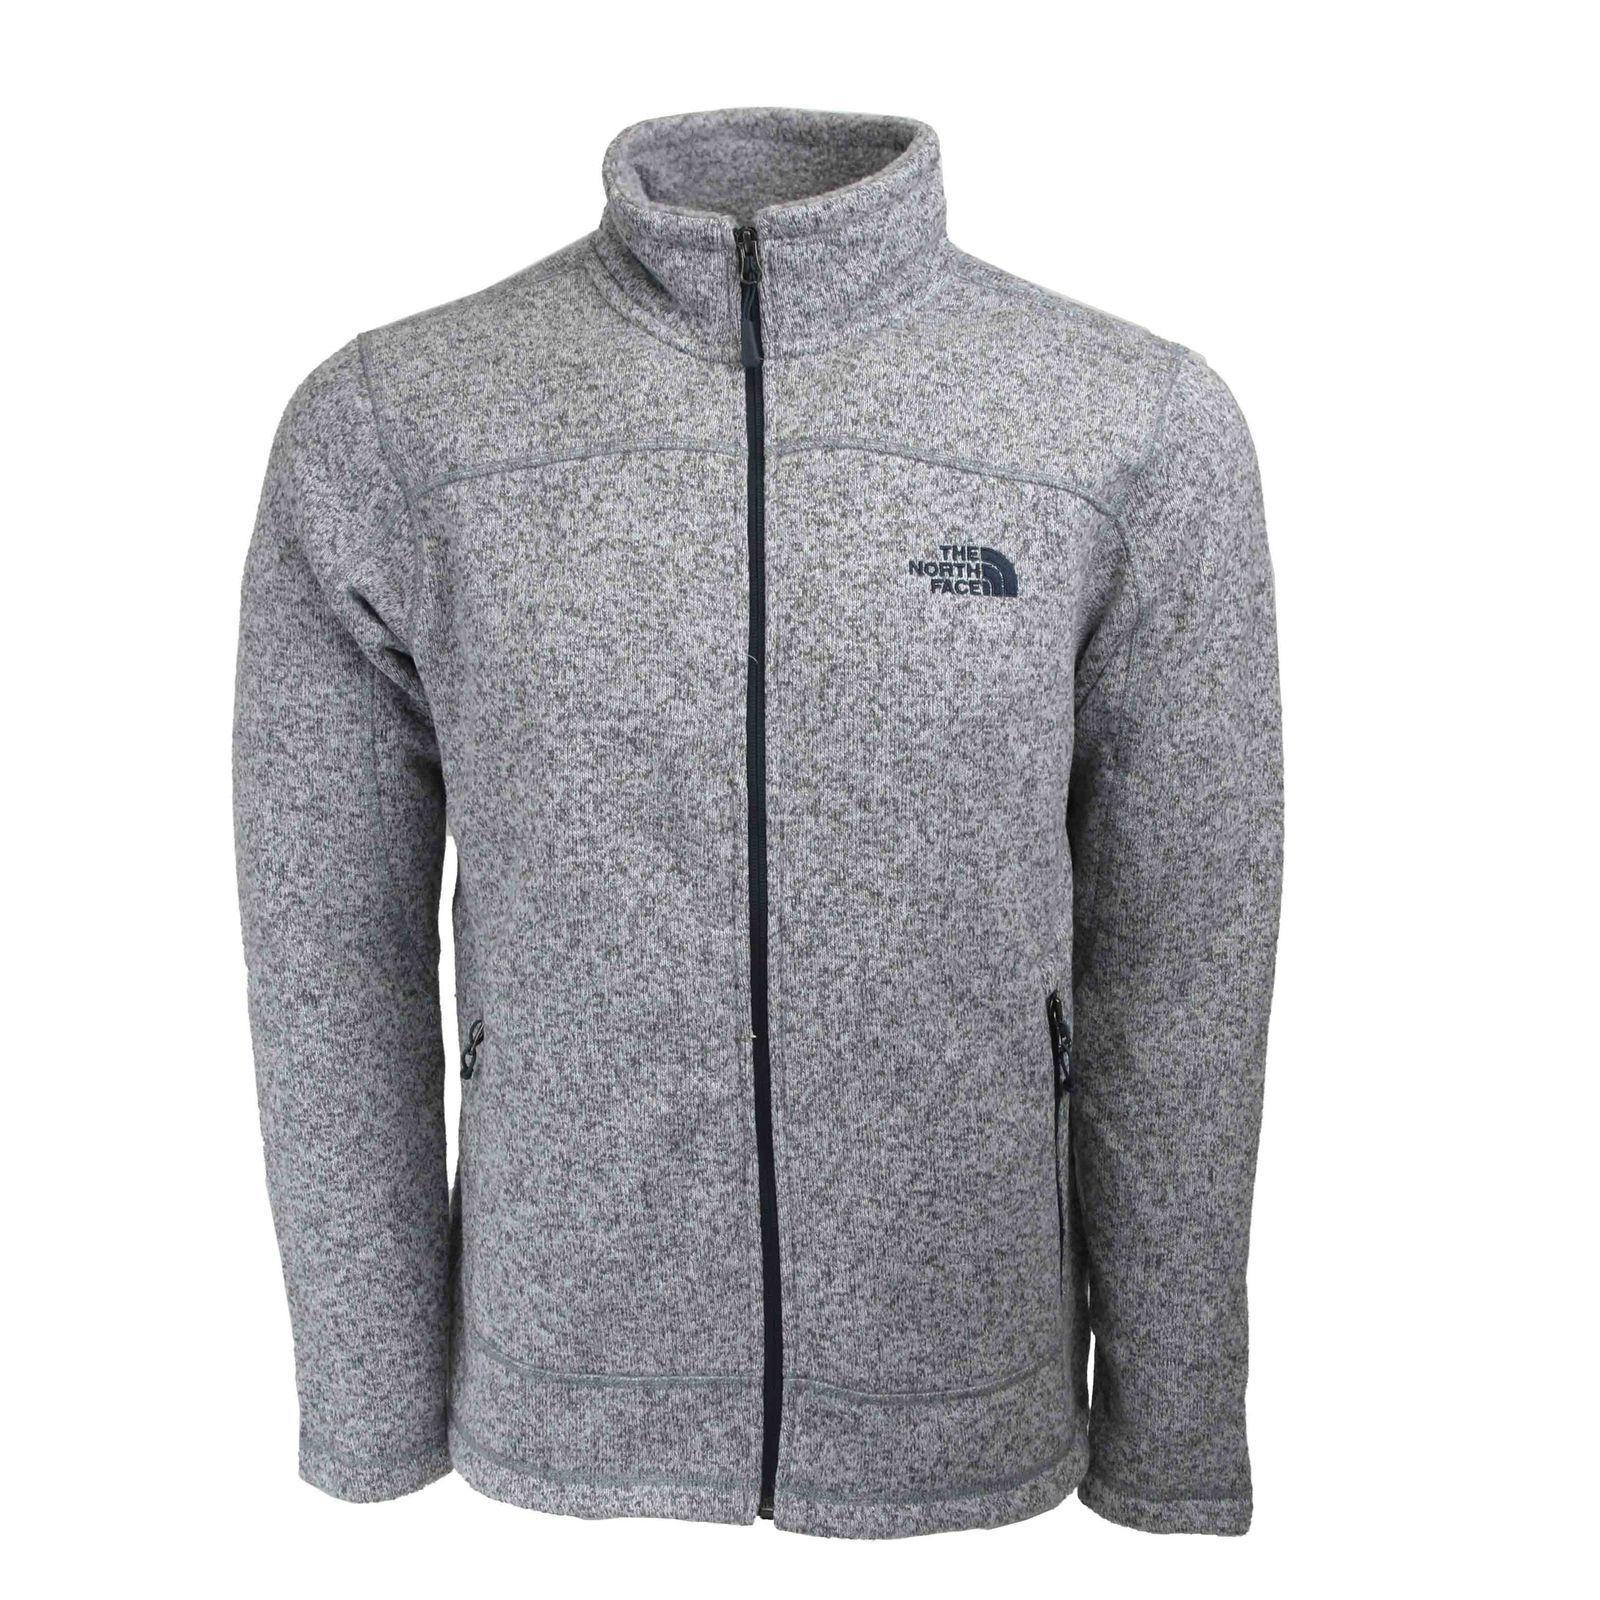 The North Face Leo Full Zip Sweater (XL) Hi Rise Grau Heather